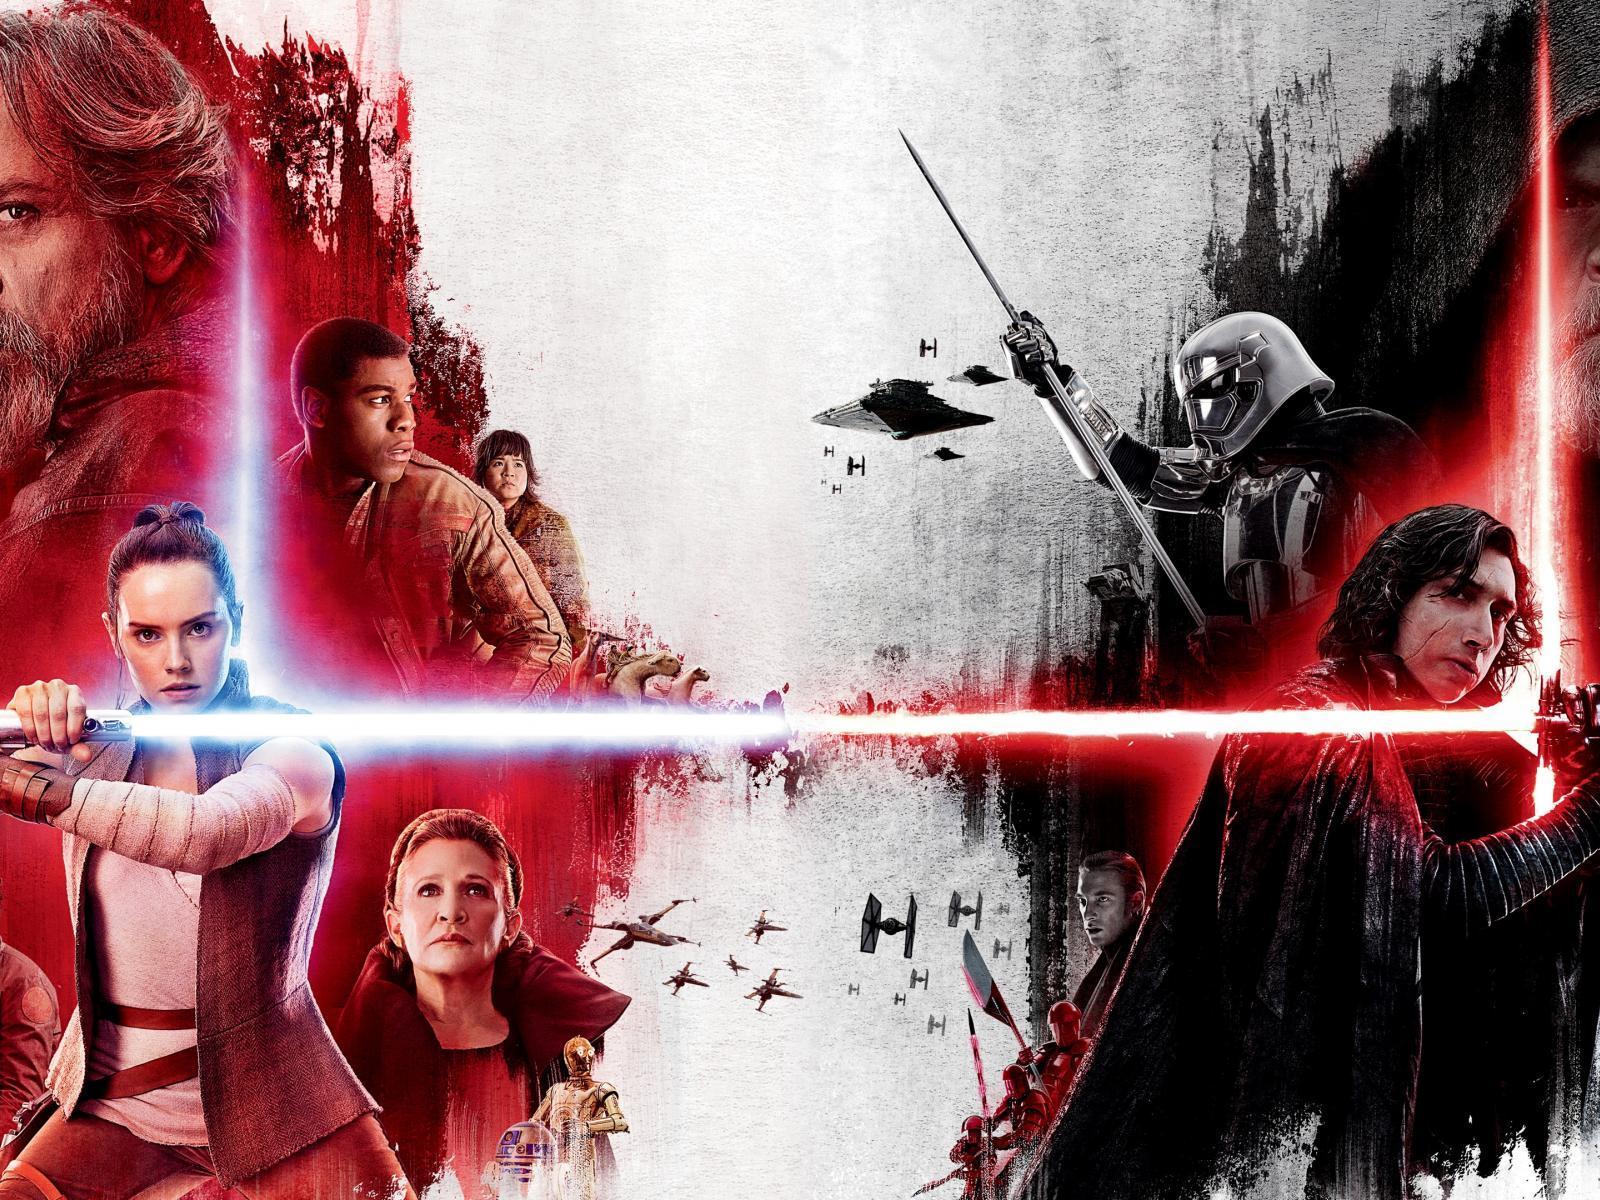 Download Star Wars Last Jedi Wallpaper Hd Backgrounds Download